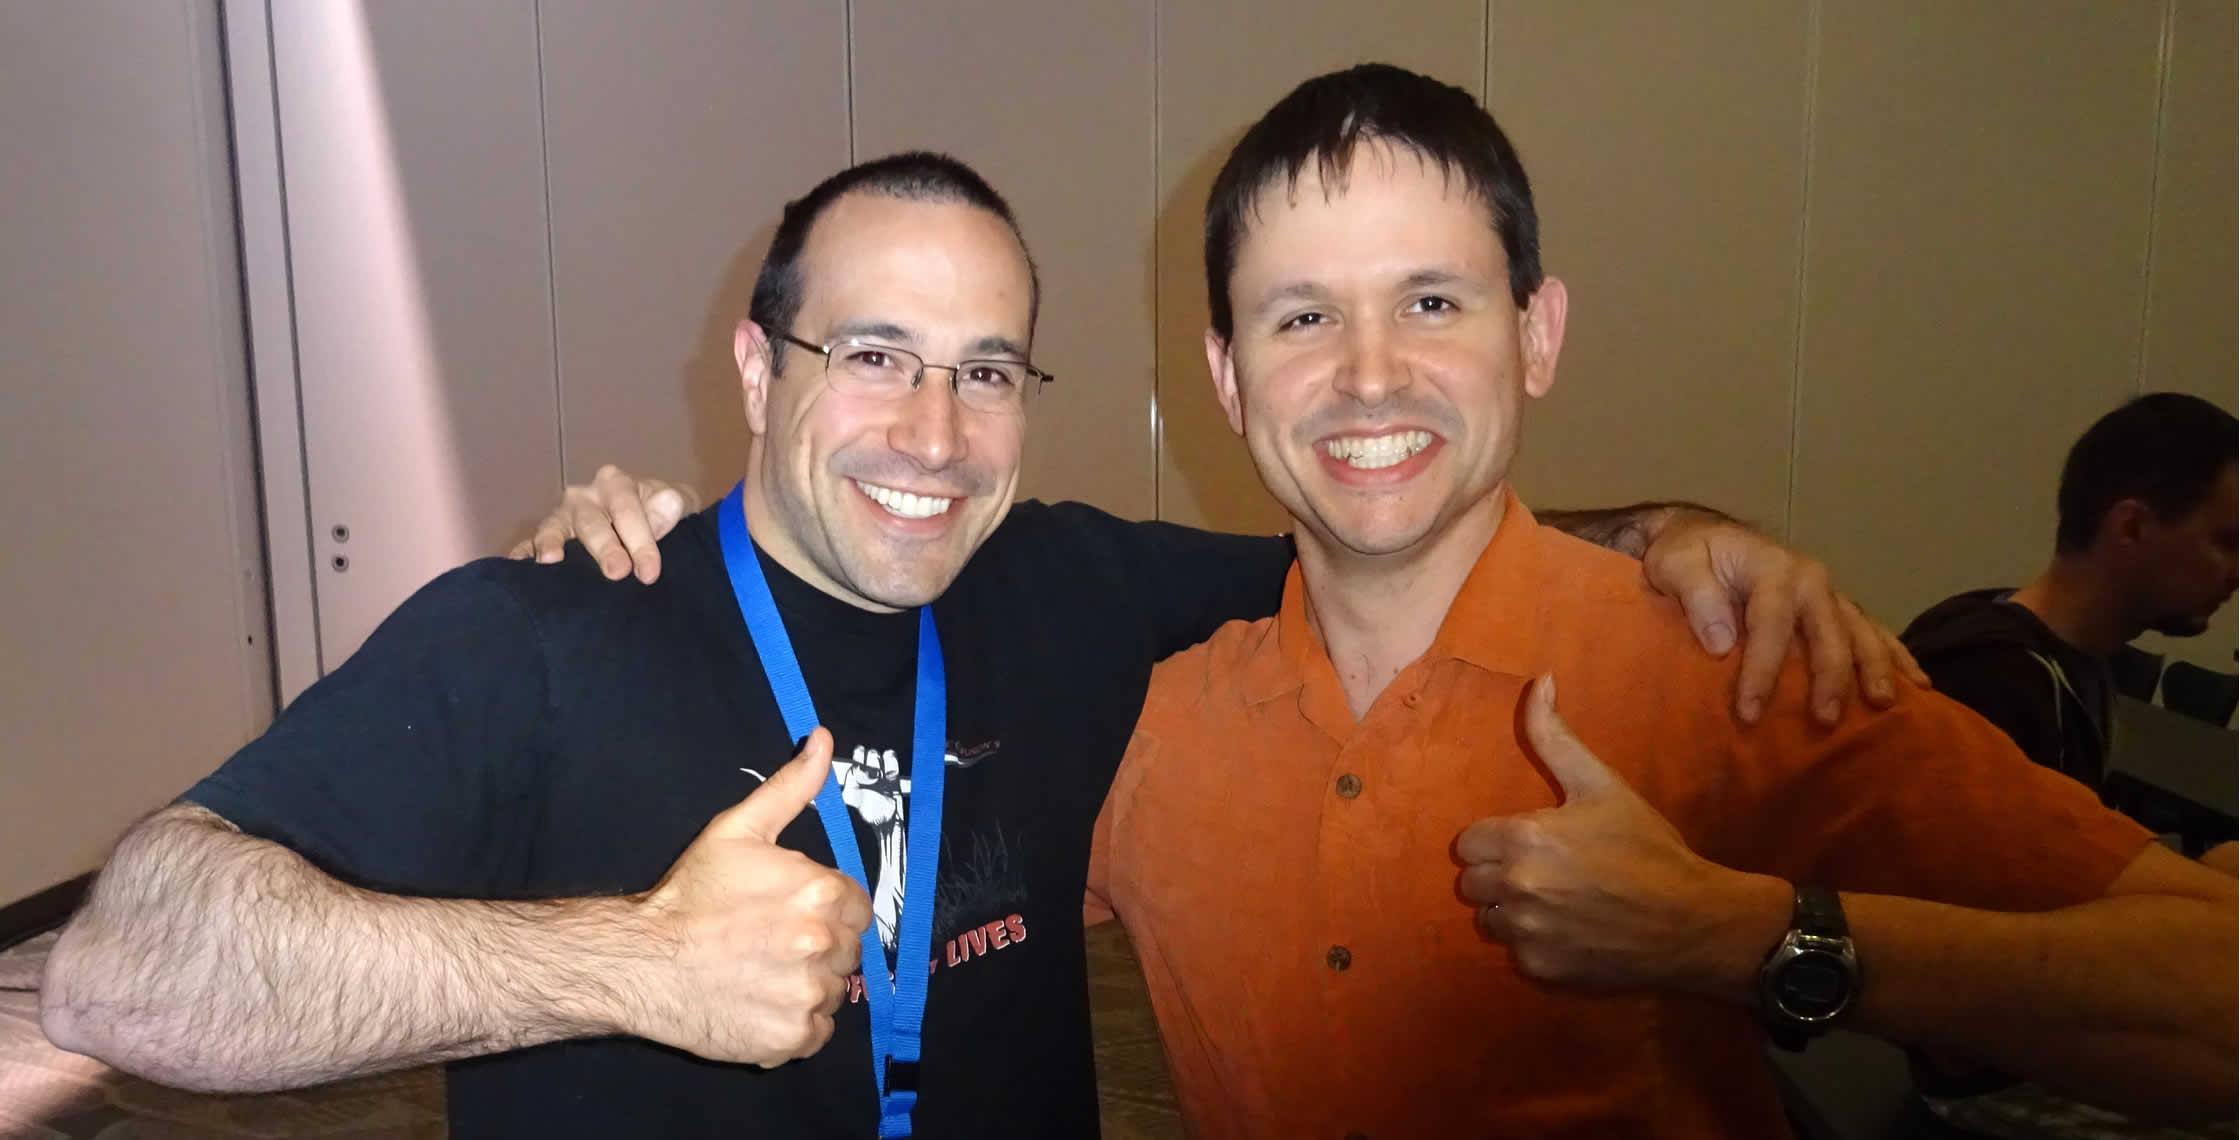 Ben Nadel at cf.Objective() 2014 (Bloomington, MN) with: Matthew Orstad